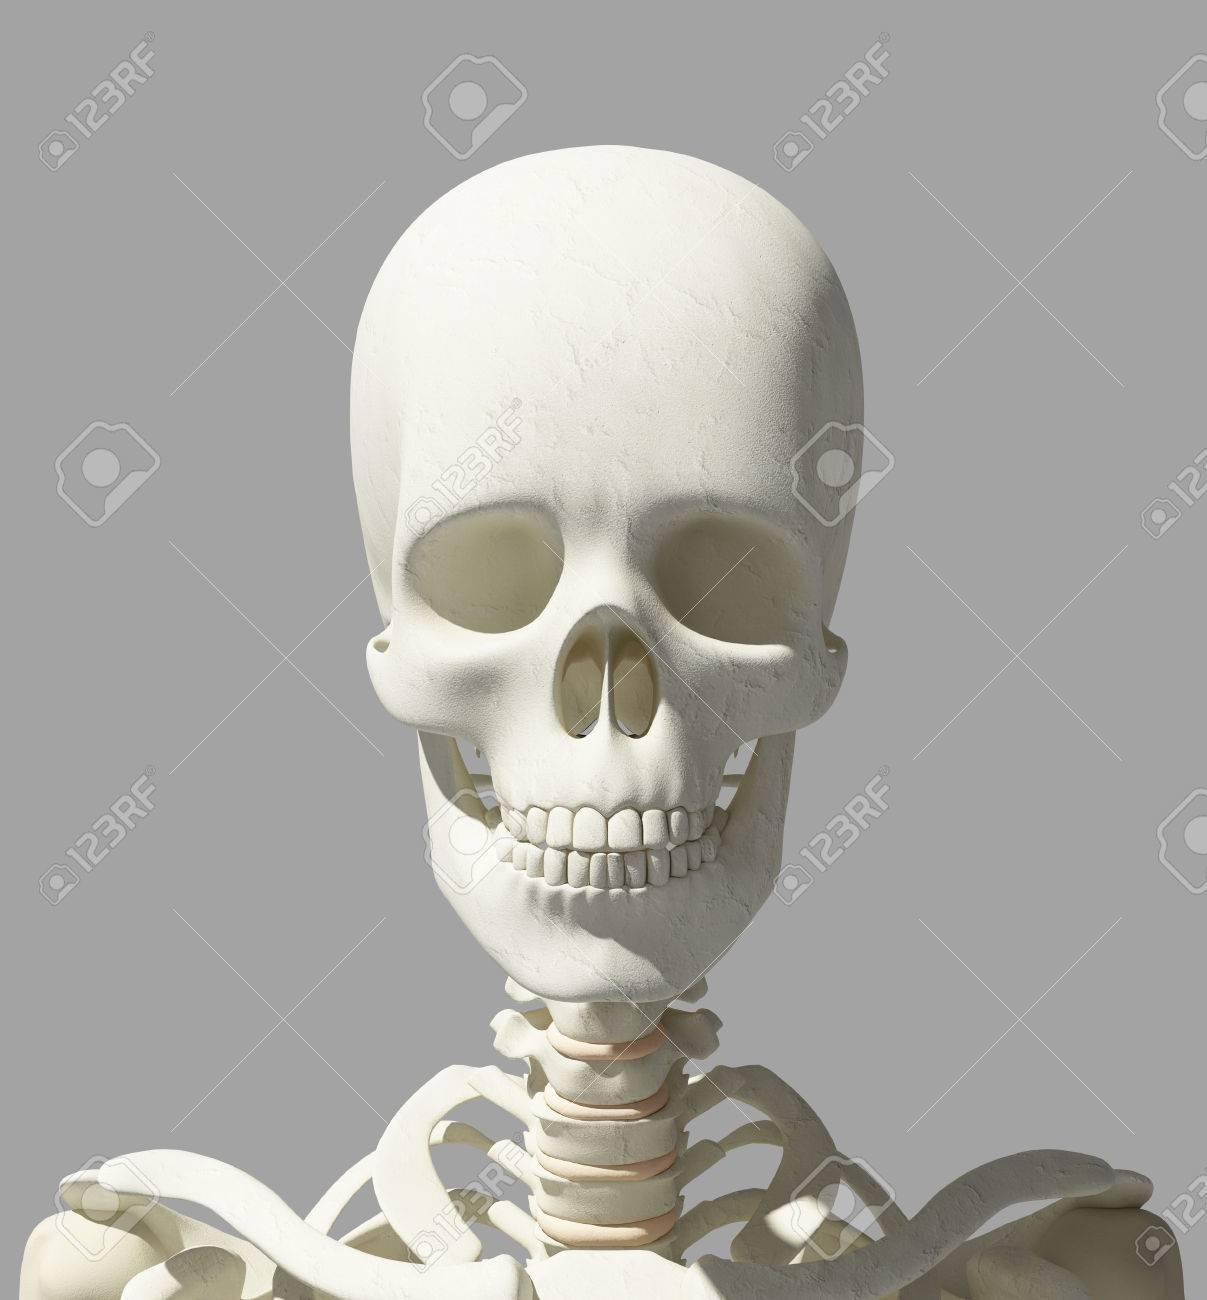 3D Illustration Of Skull Anatomy - Part Of Human Skeleton, Medical ...